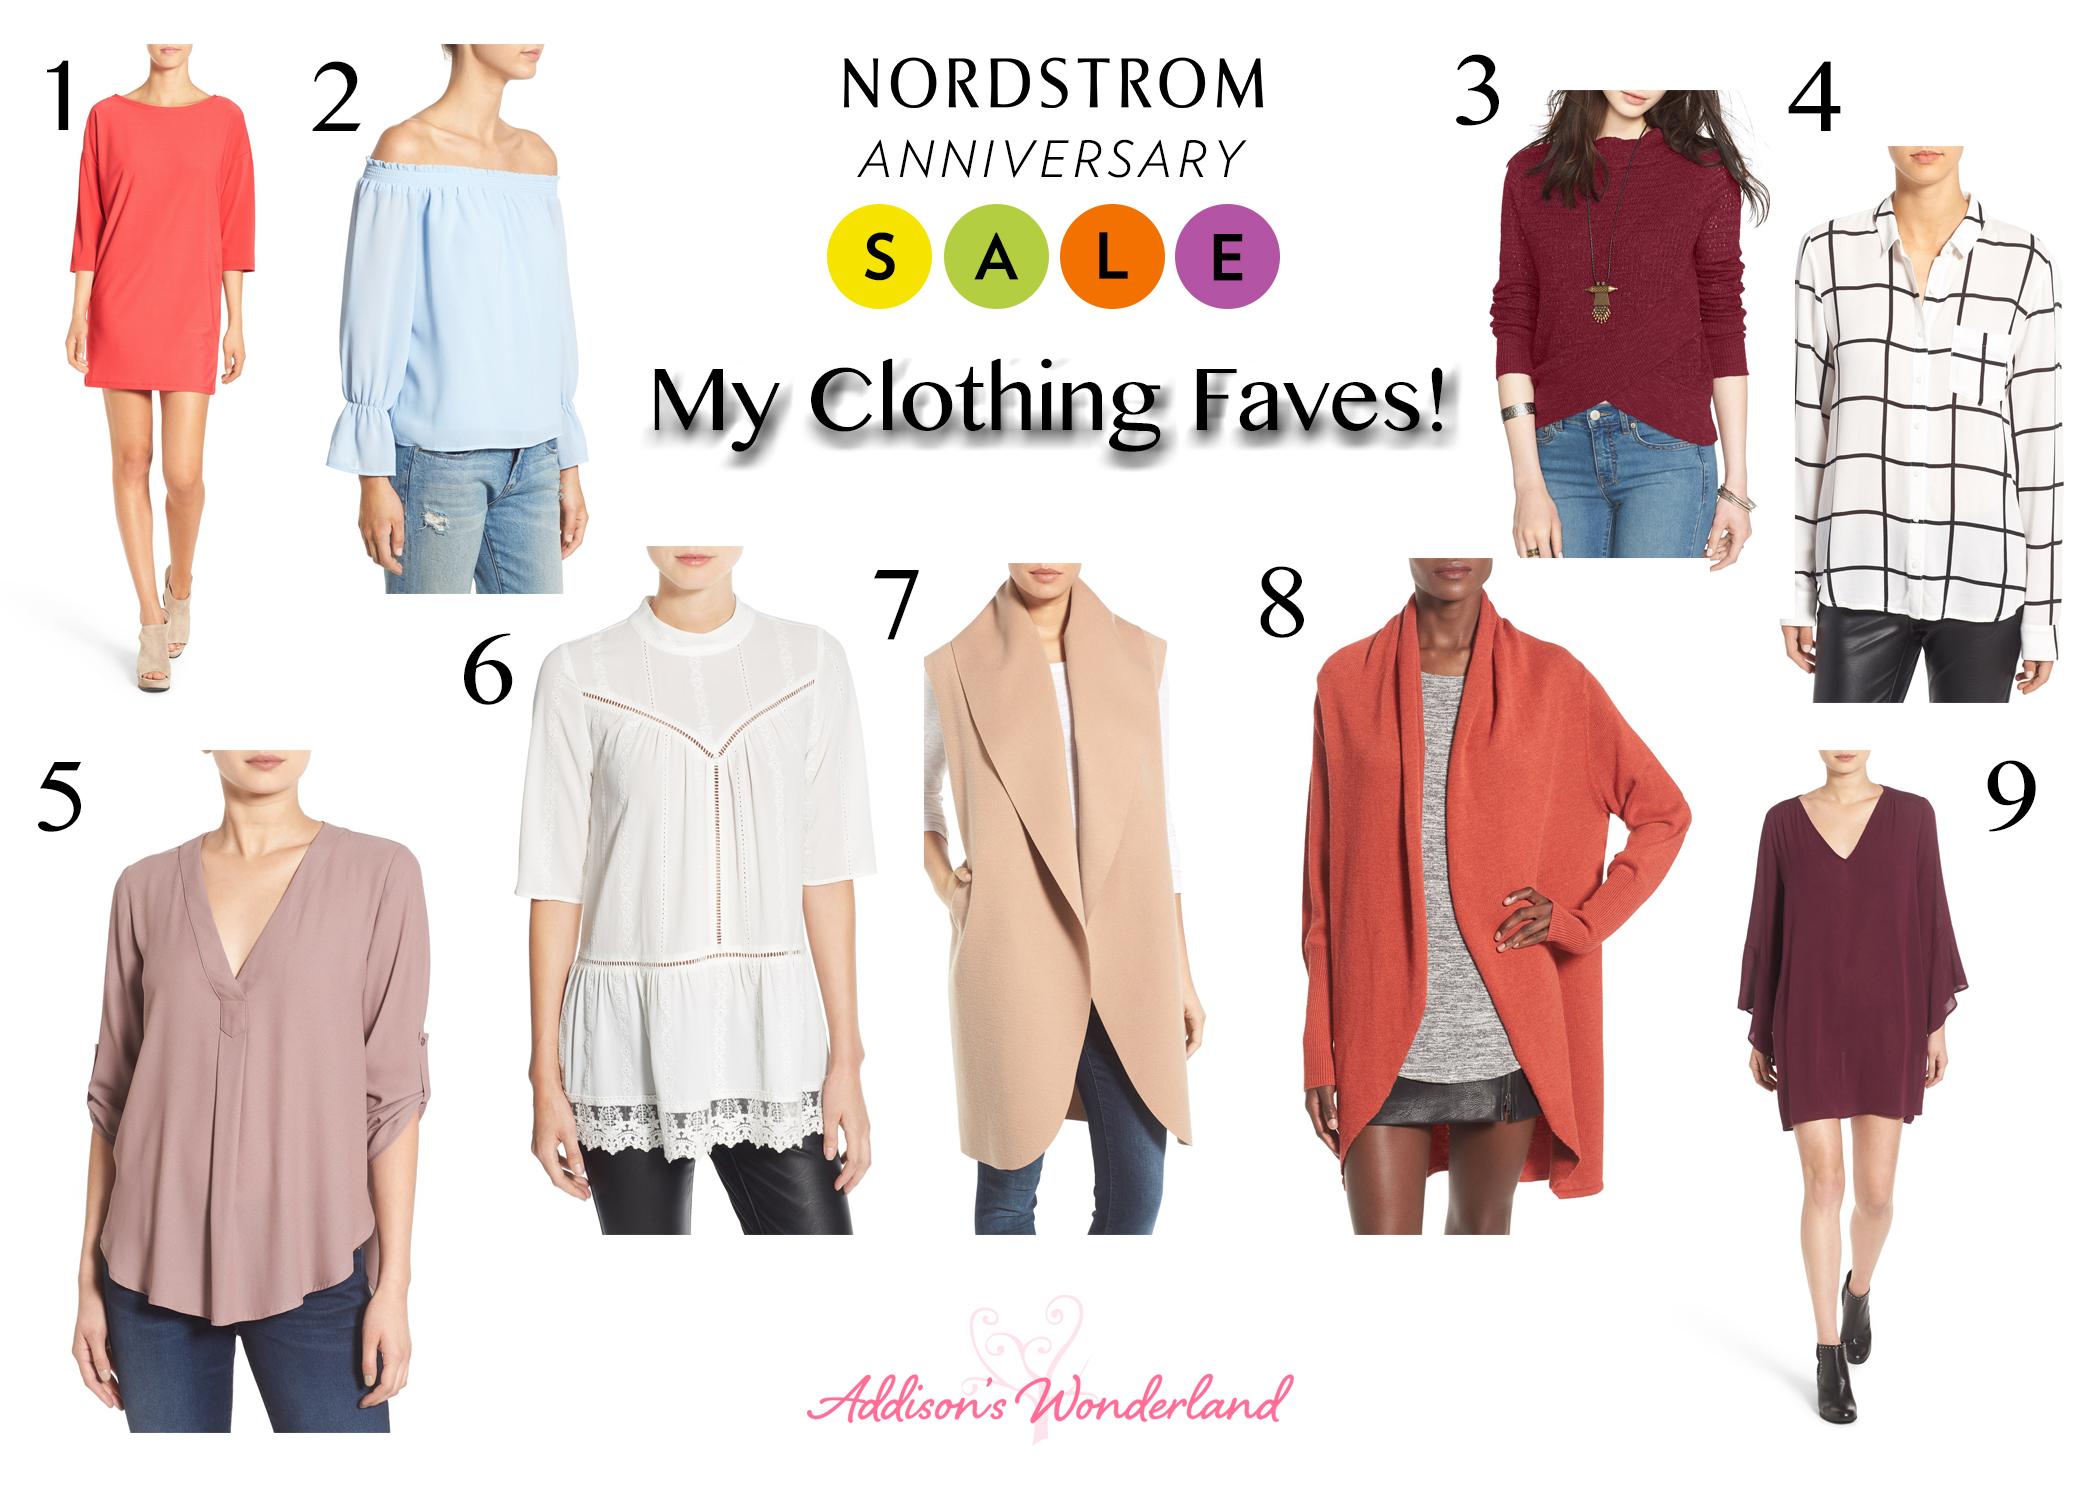 Nordstrom anniversary sale clothing addison s wonderland